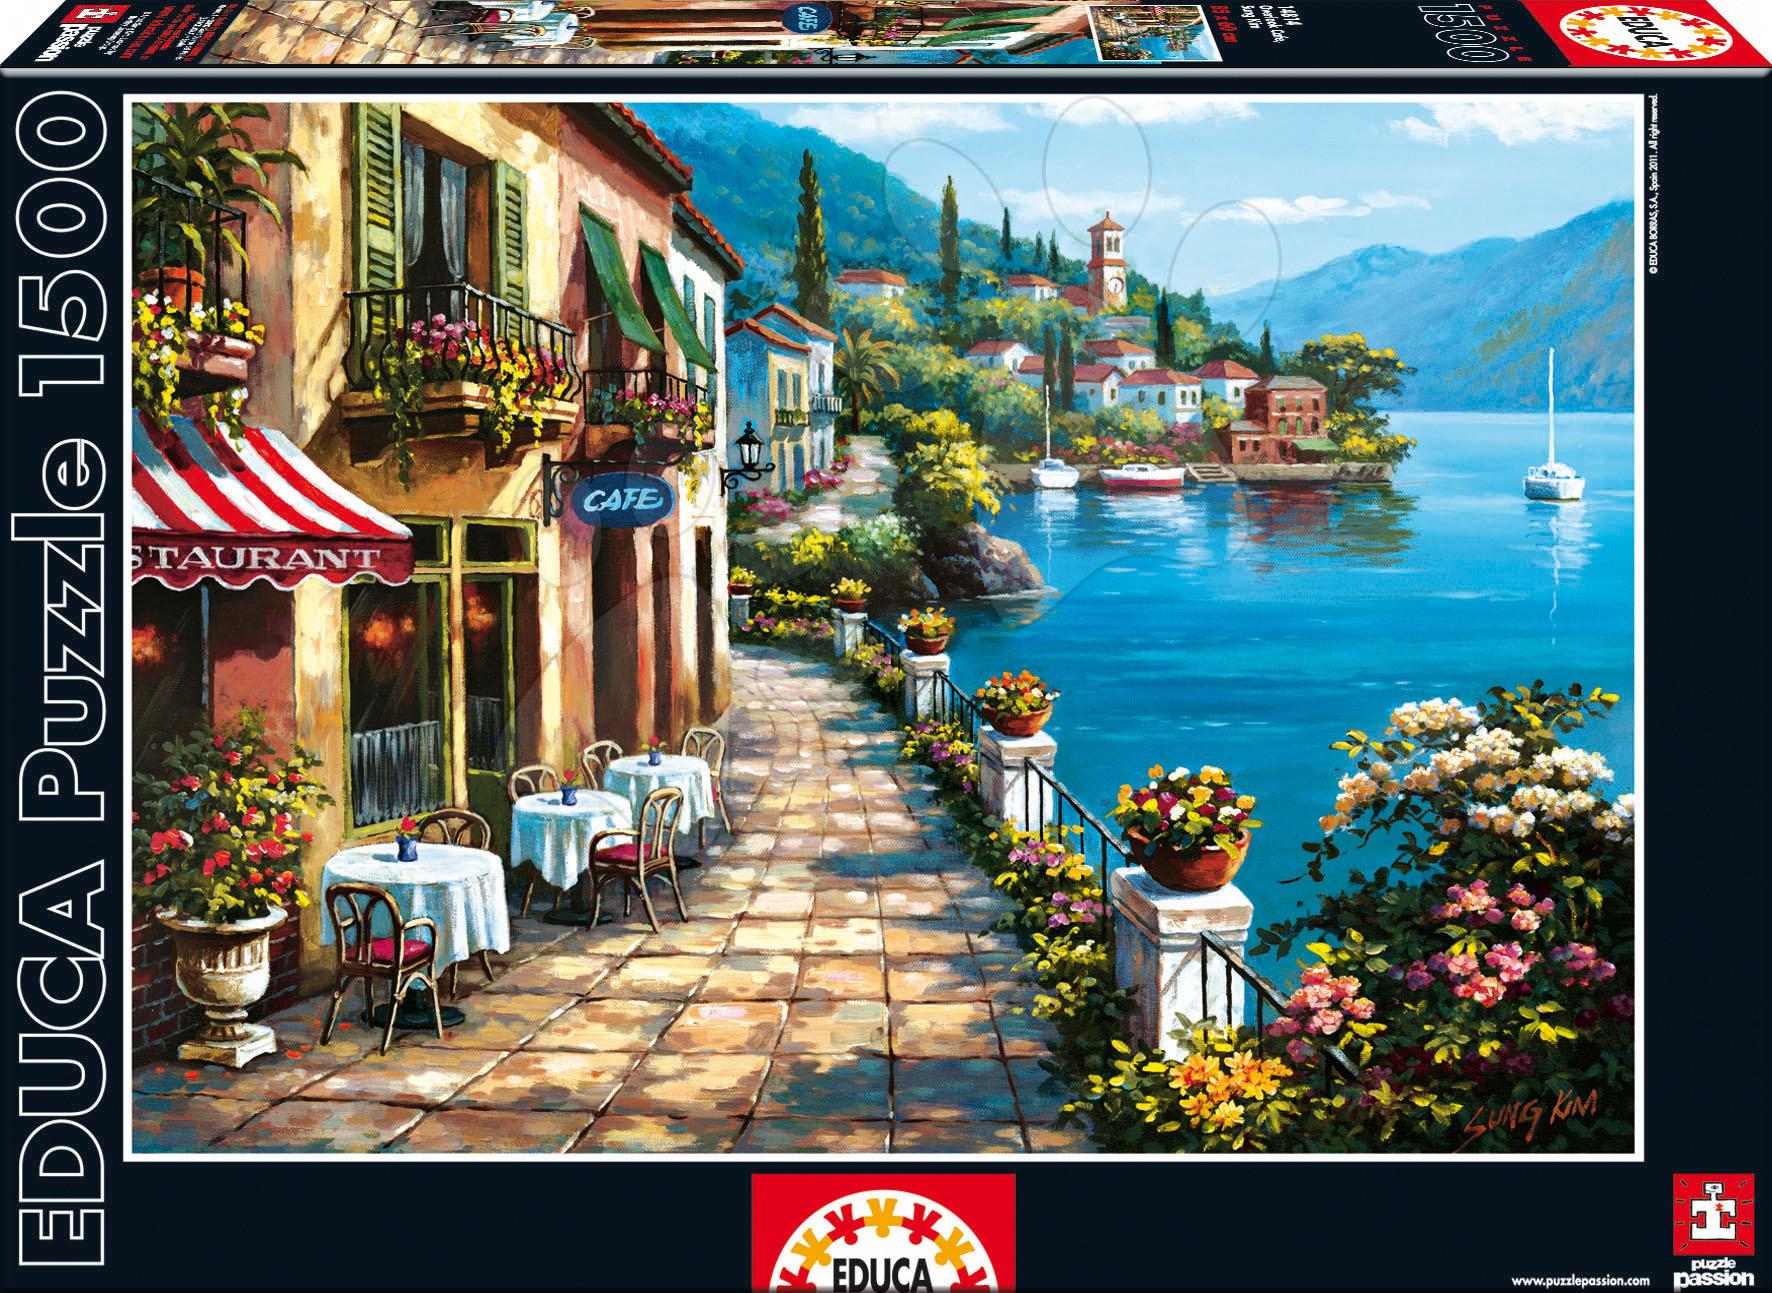 1500 darabos puzzle - Puzzle Overlook Cafe, Sung Kim Educa 1 500 db